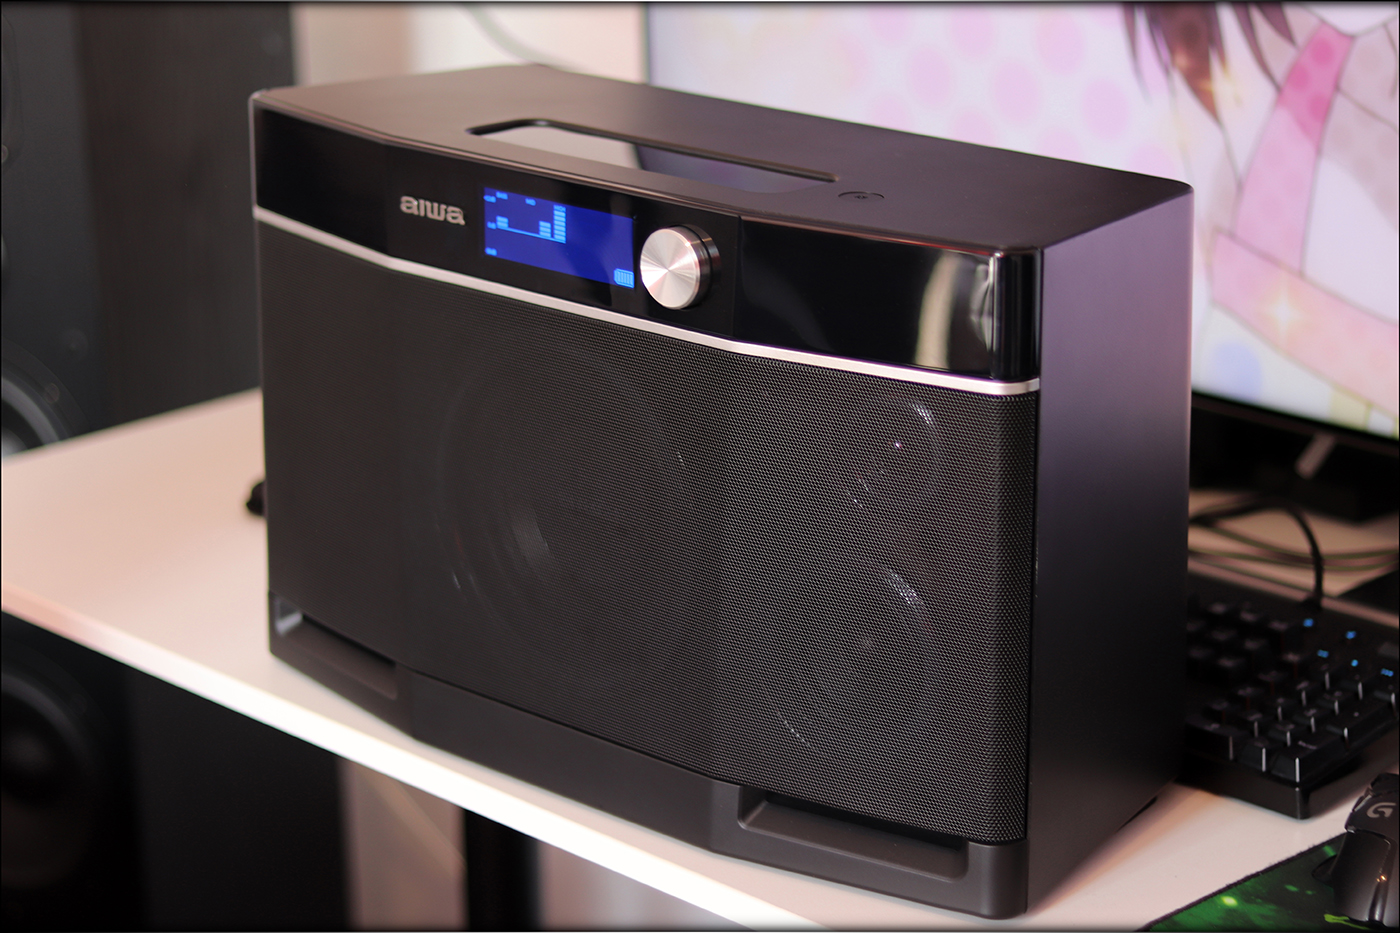 AIWA-Exos-9-Exos9-Nine-Bluetooth-Speaker-3-Way-Crossover-Midrange-5-Drivers-Audiophile-Heaven-Review-16.jpg